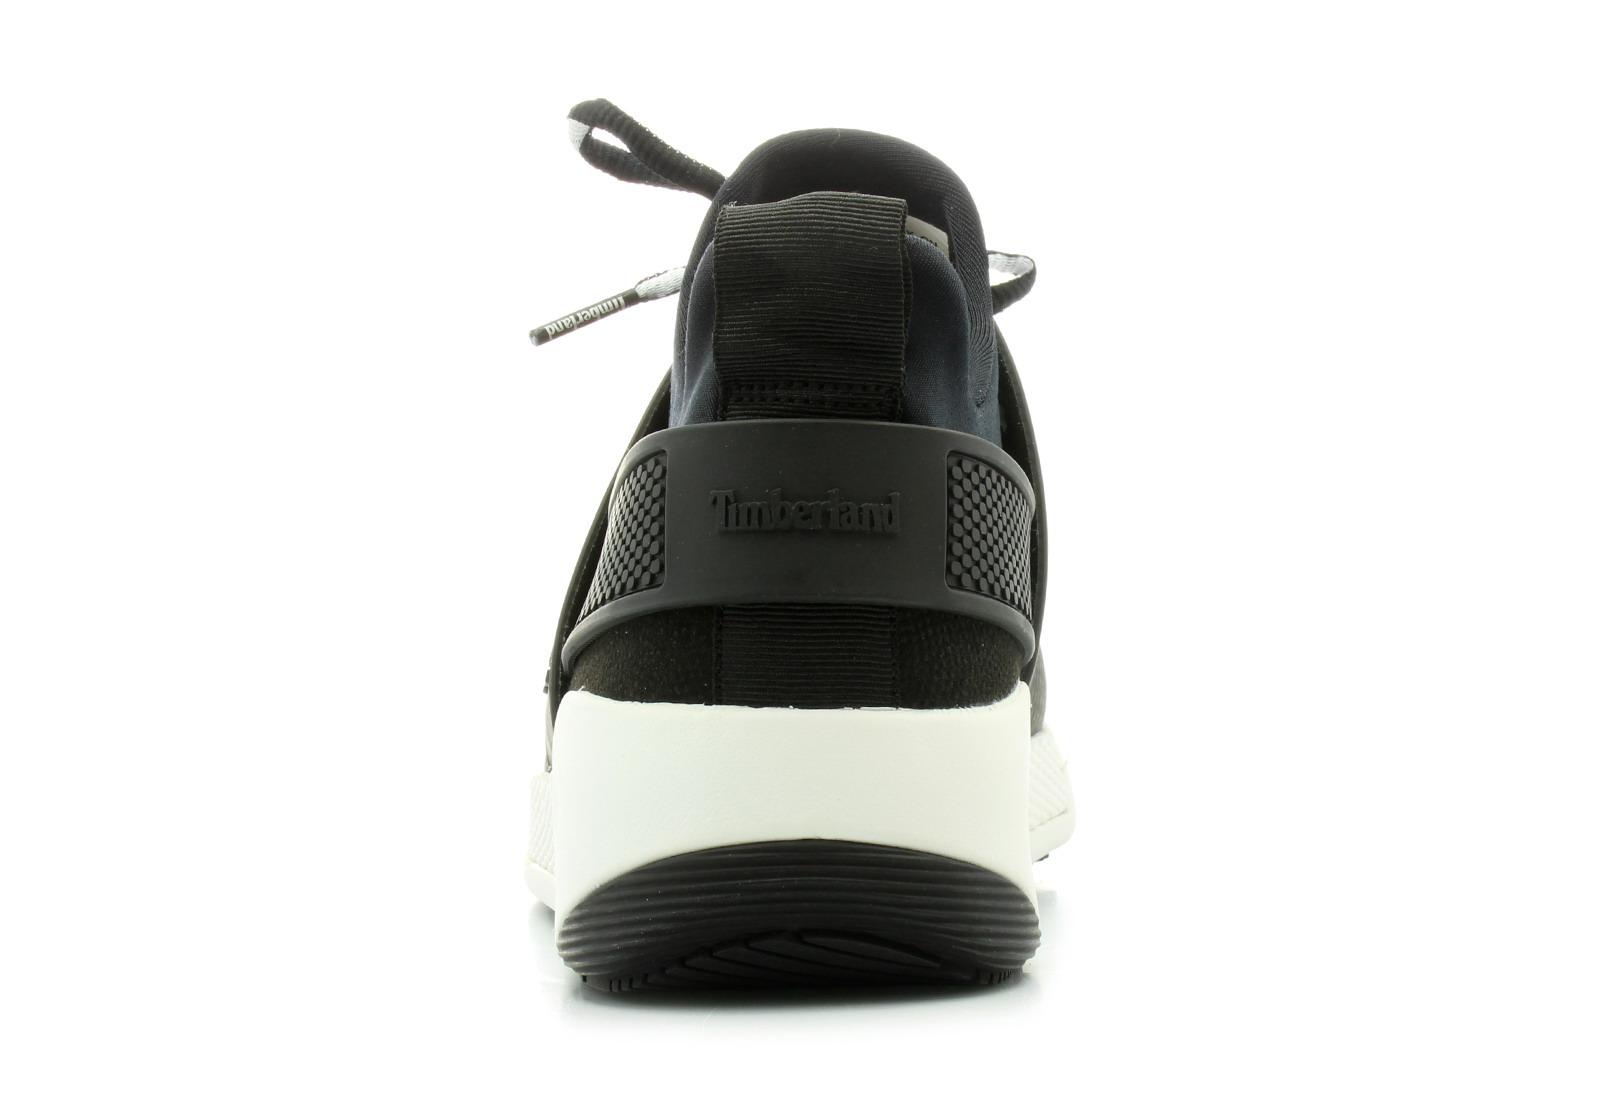 Timberland Cipo Kiri Up Knit Oxford A1UJW blk Office Shoes Magyarország